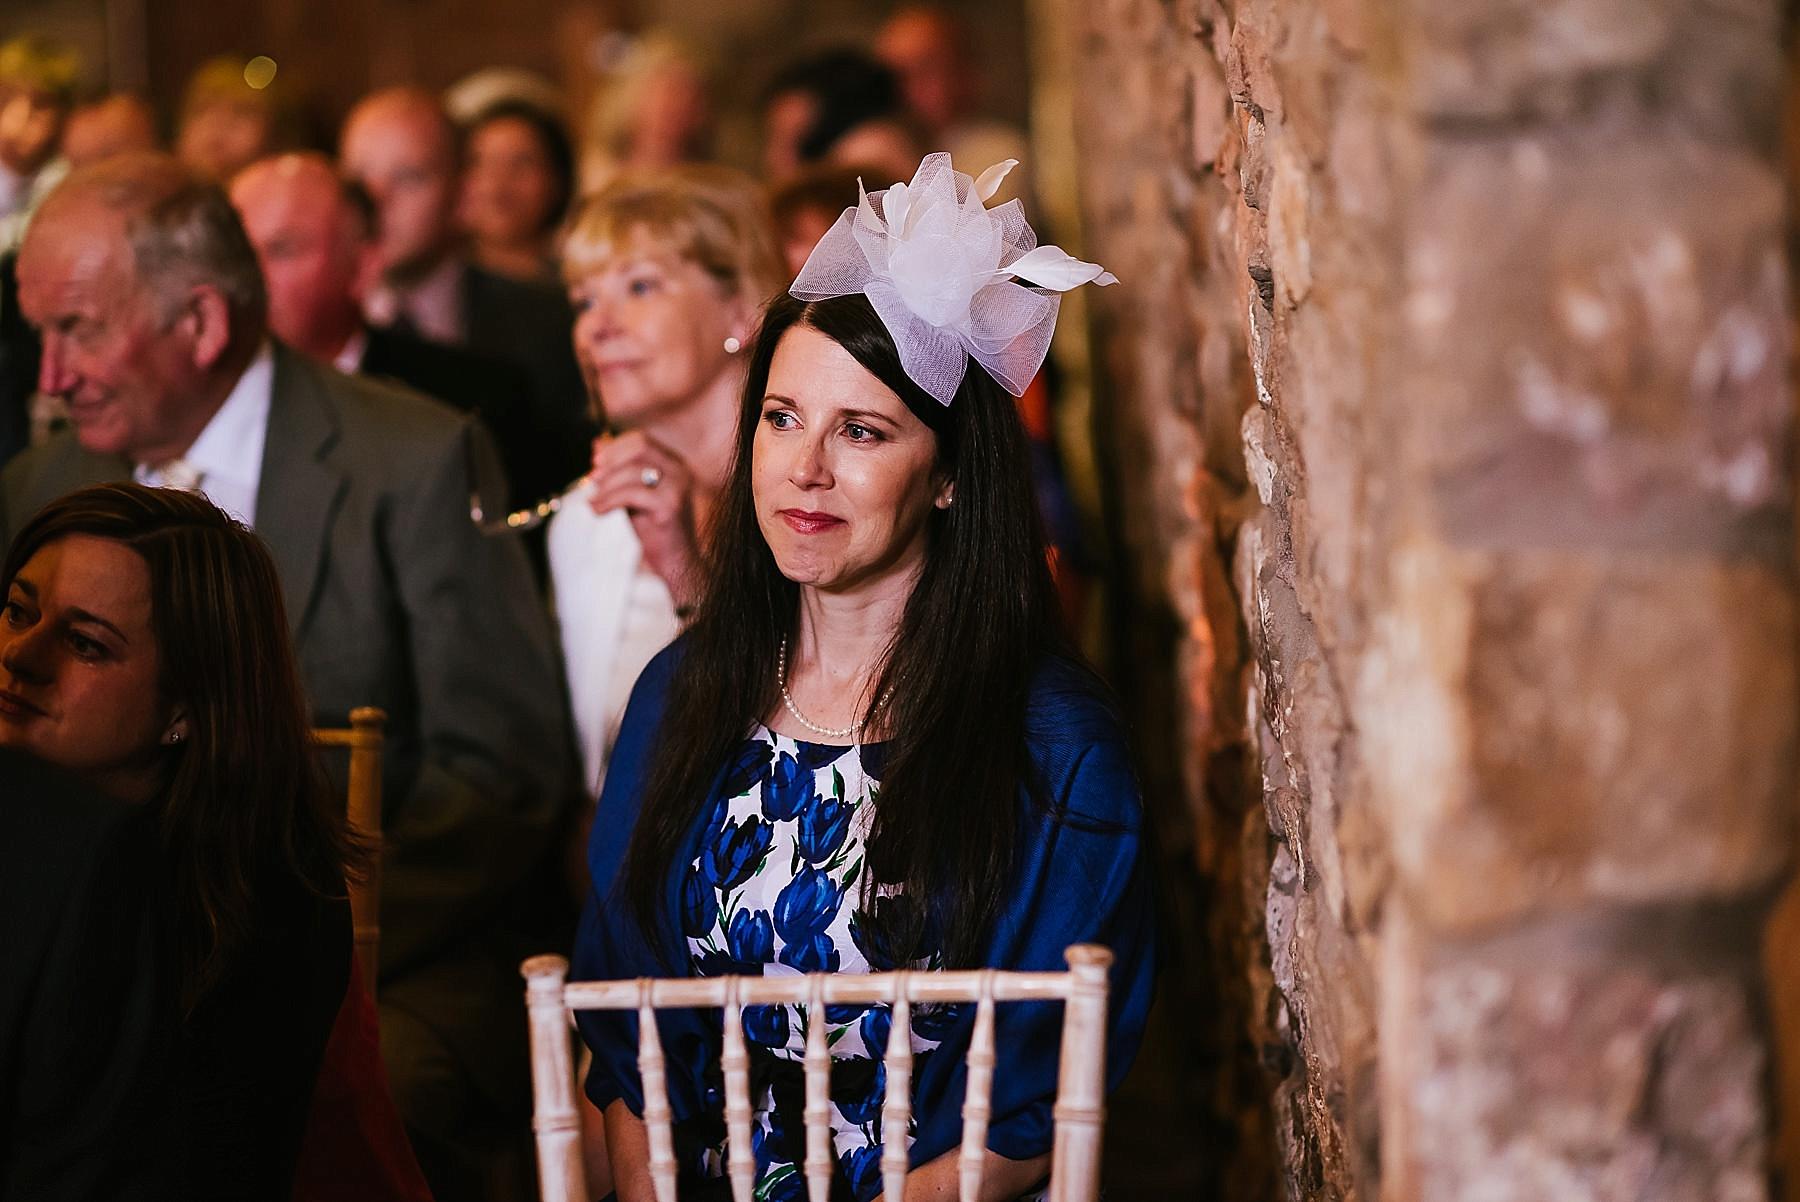 wedding guest looking emotional